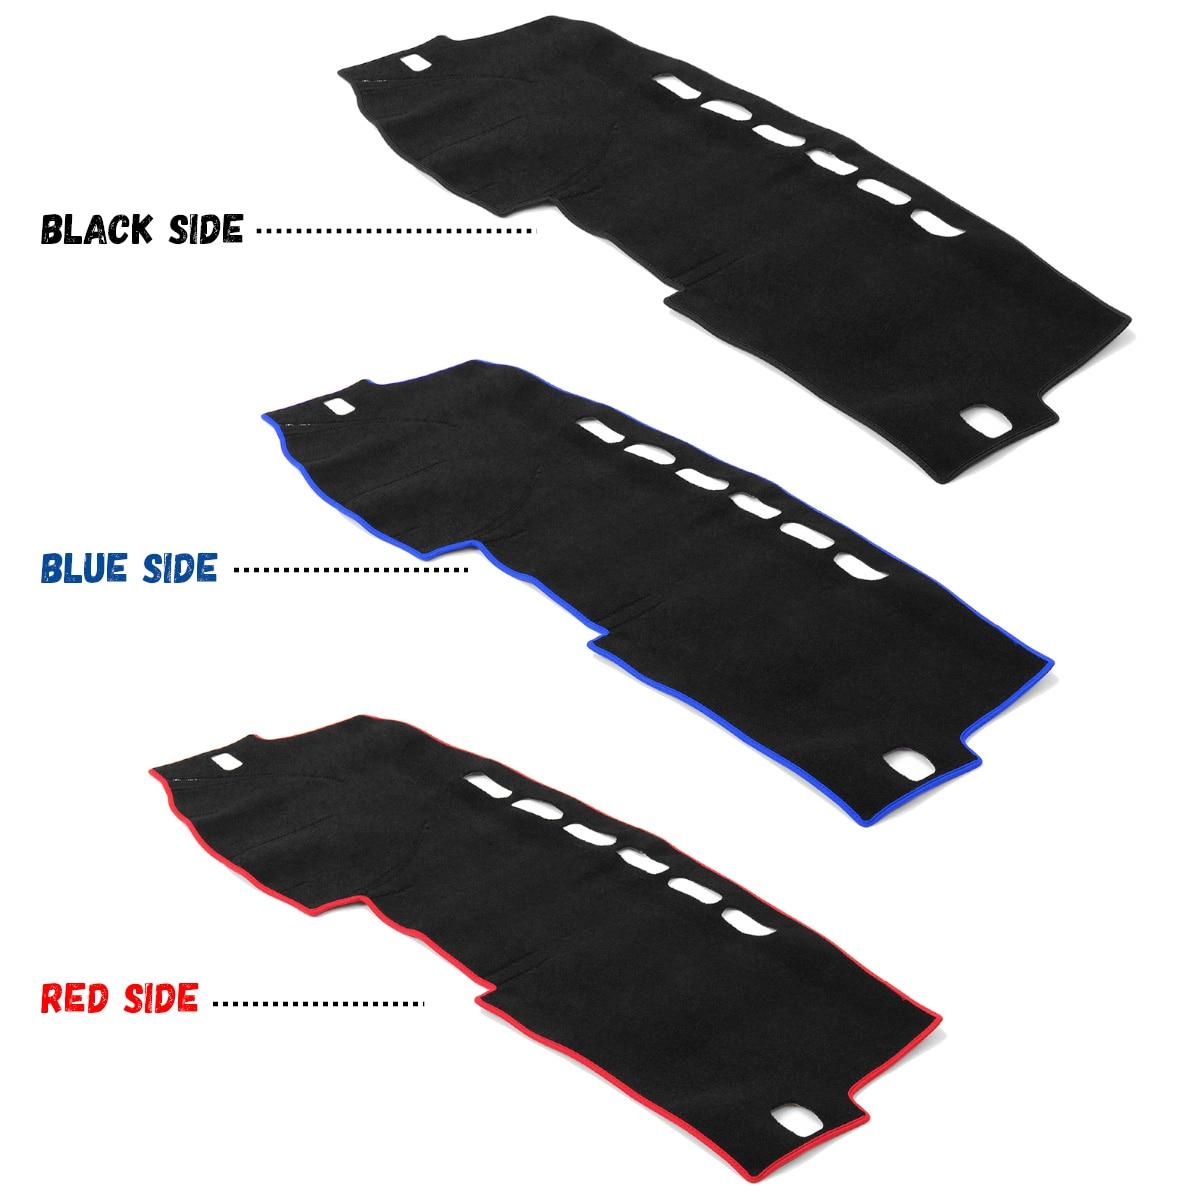 For Toyota Corolla 2007 2013 LHD Dashboard Cover Dashmat Sun Shade Pad Dash Board Carpet Covers|Car Anti-dirty Pad| |  - title=